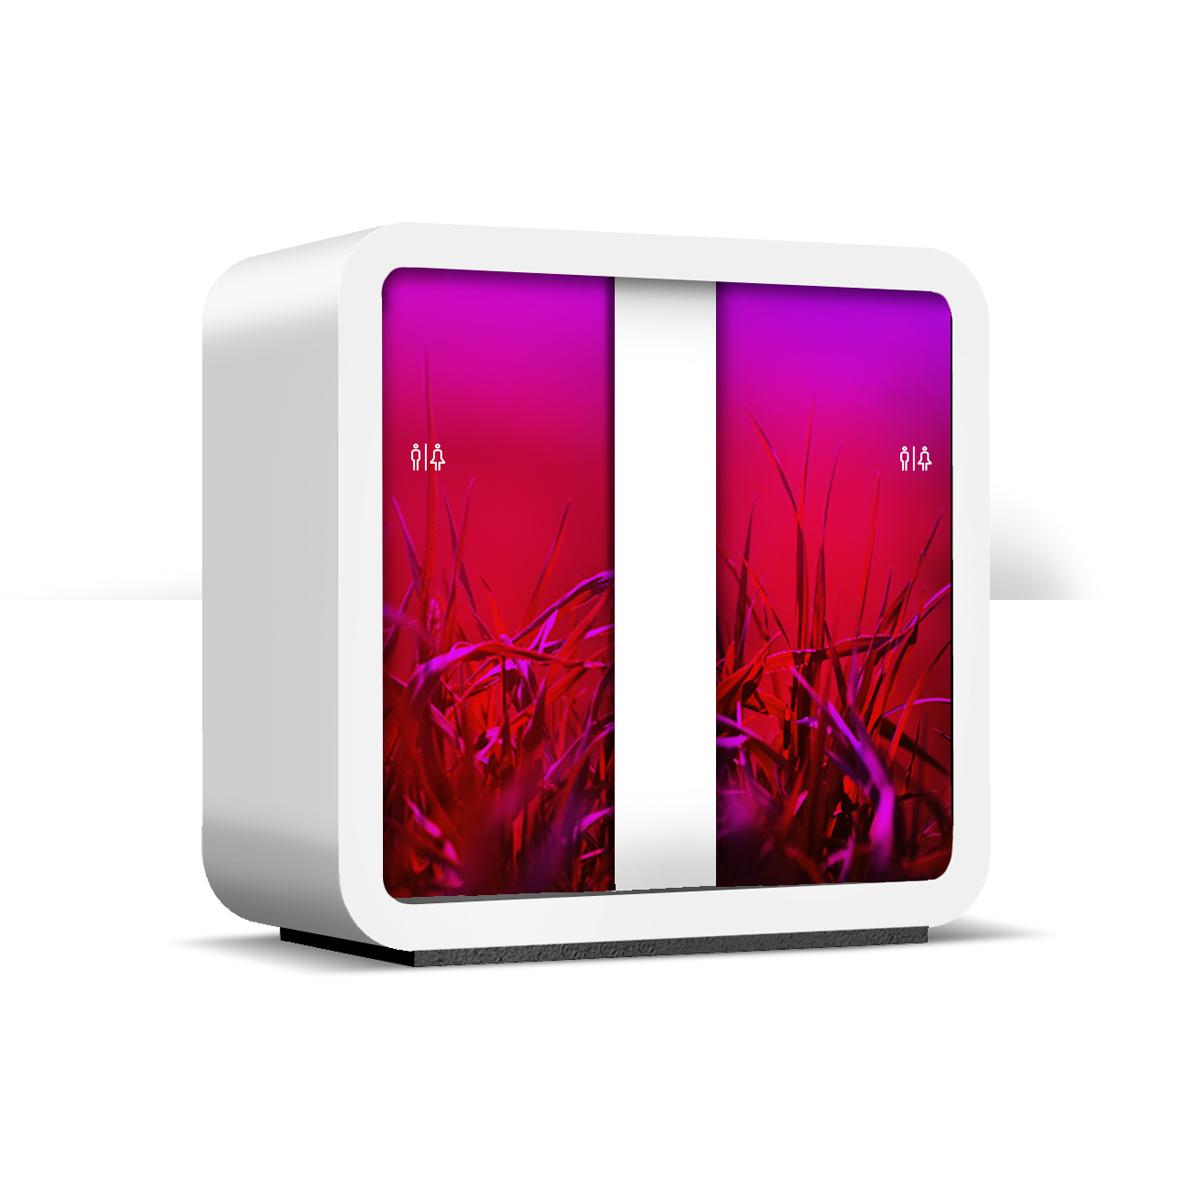 Visual T-cube Van Overbeek